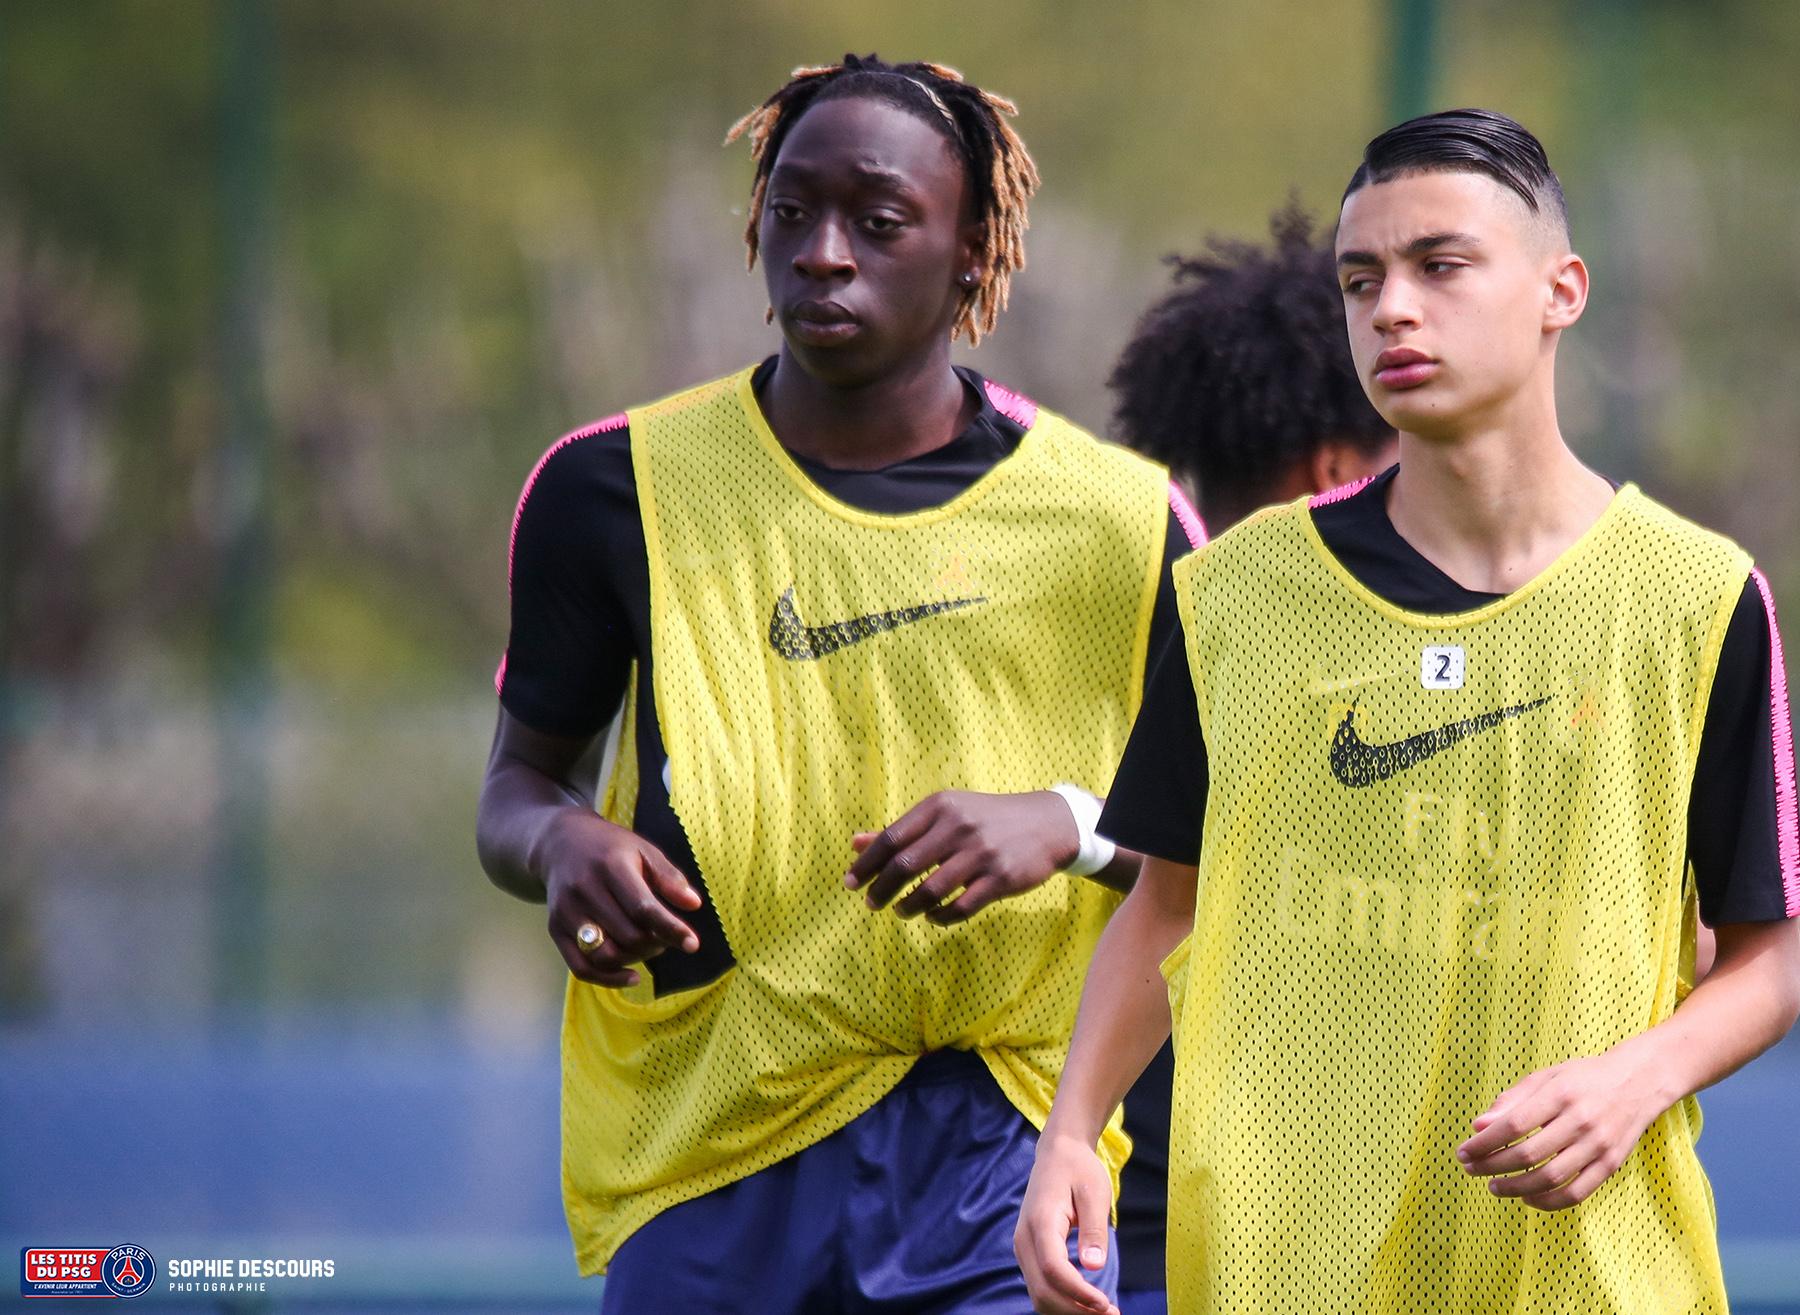 Tanguy Coulibaly attaquant U19 pendant le match PSG-LOSC le 21/04/2019